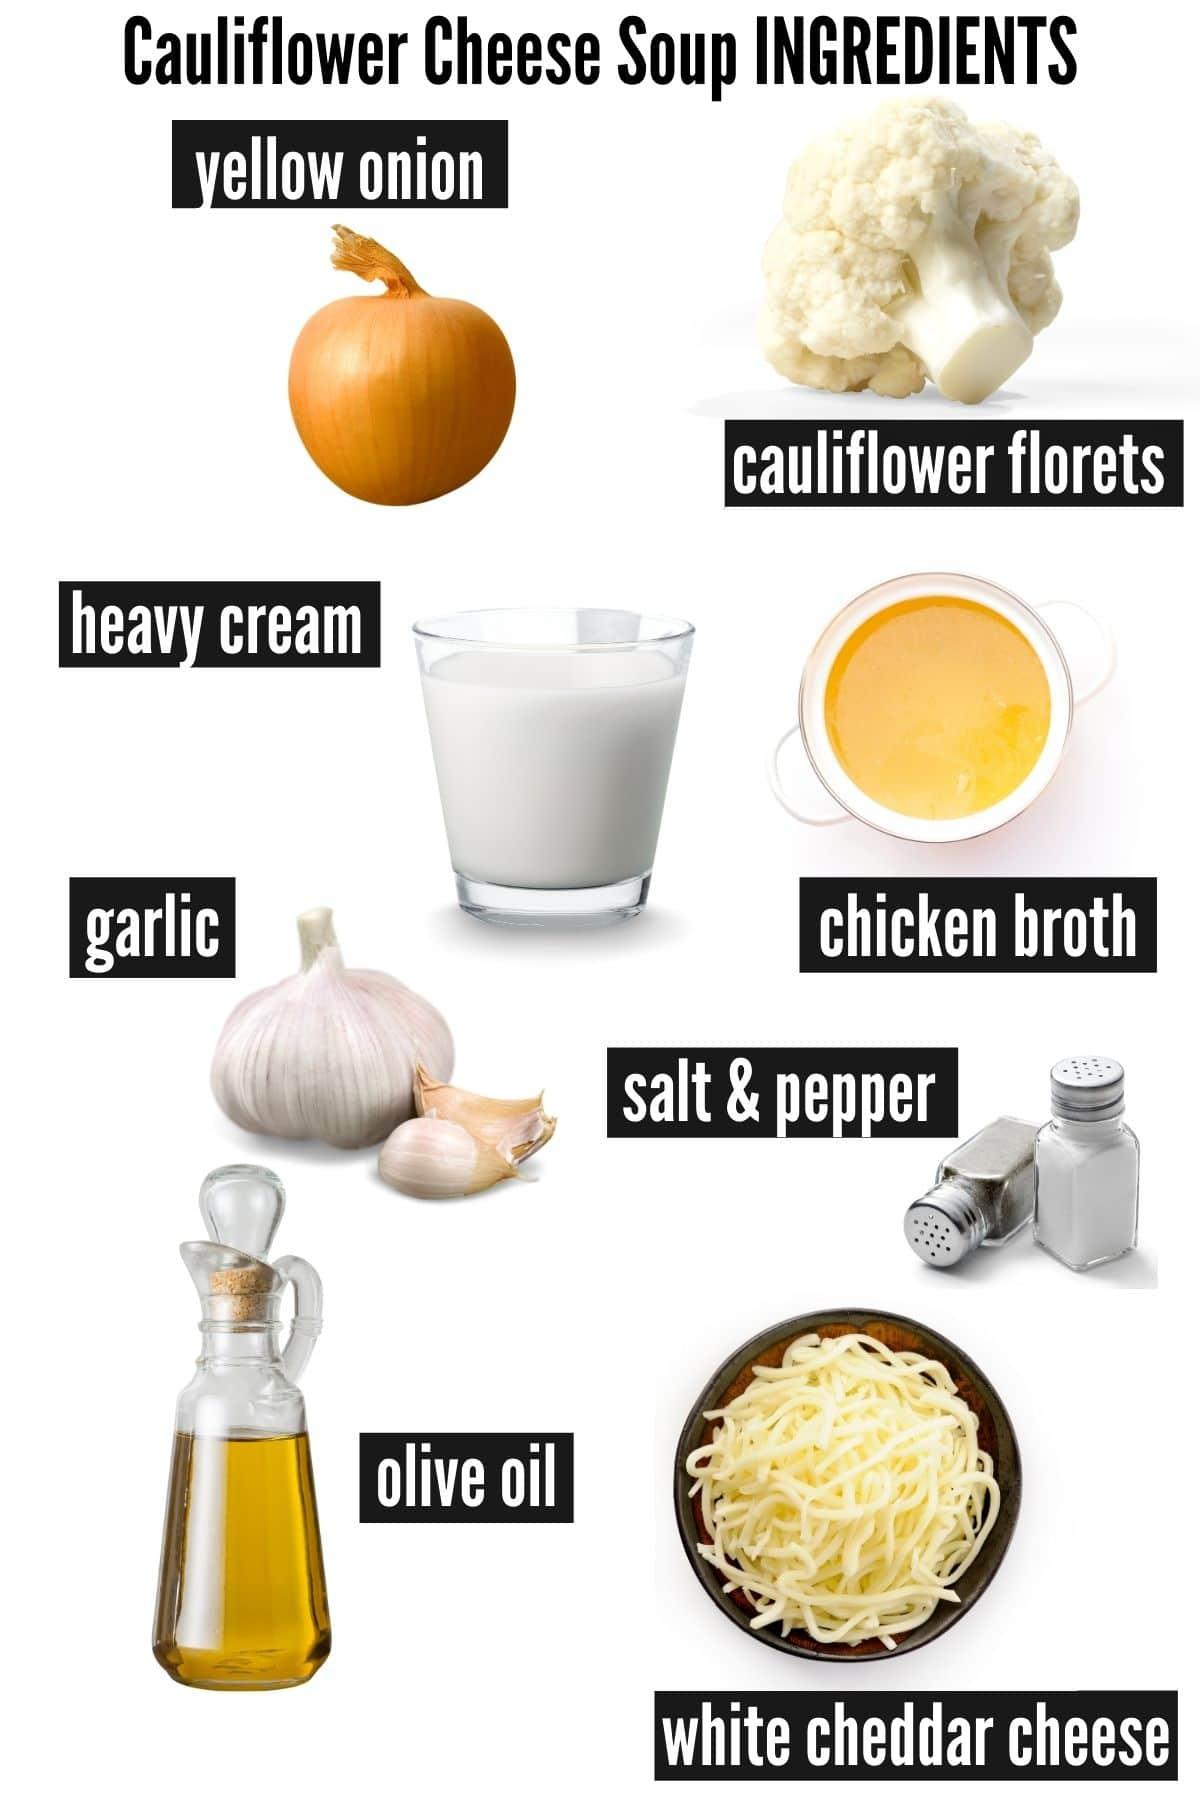 cauliflower cheese soup ingredients